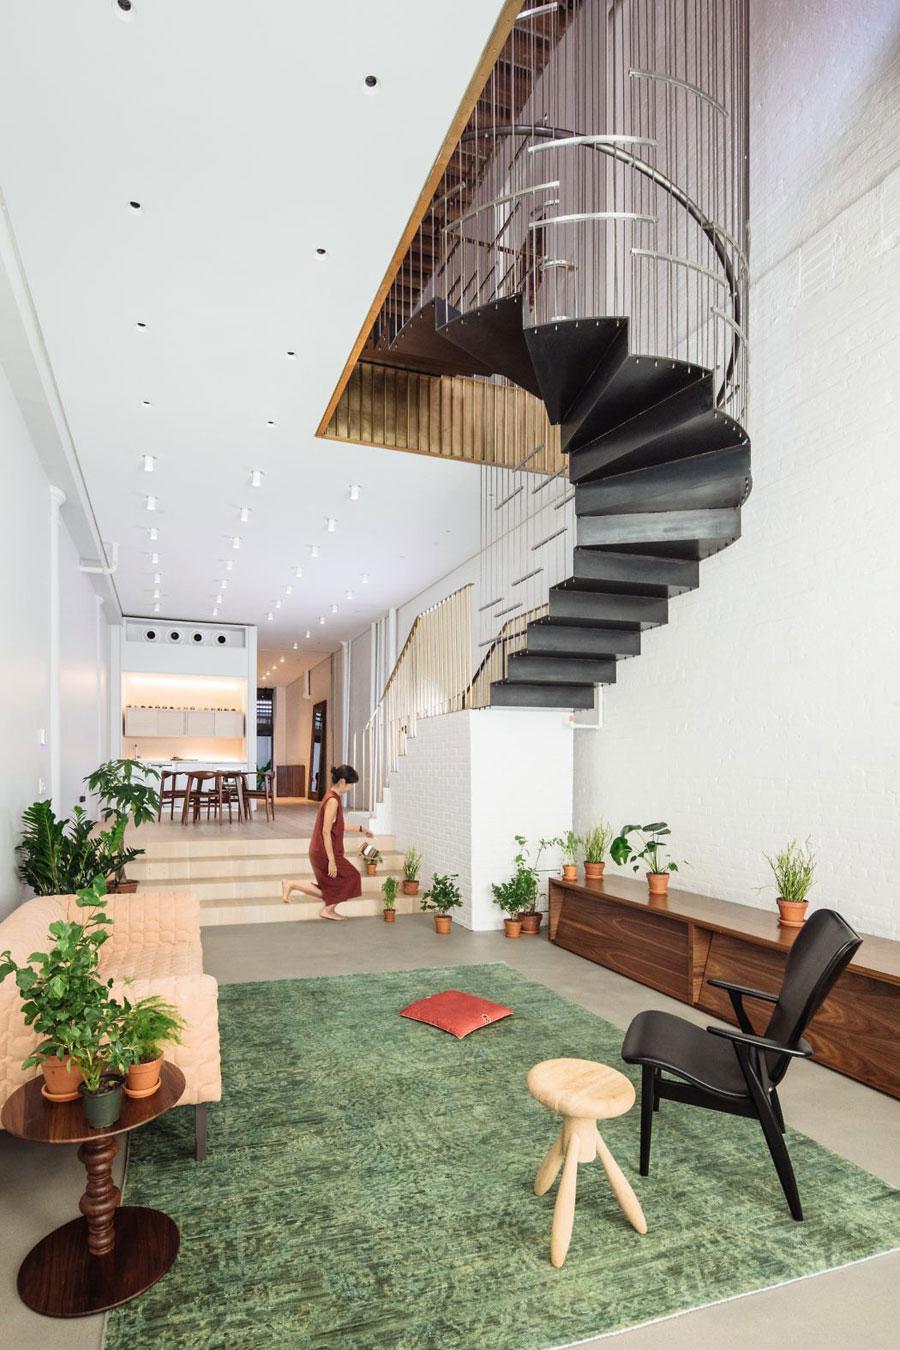 Architect Dash Marshall voegt twee woningen tot één grotere familiewoning